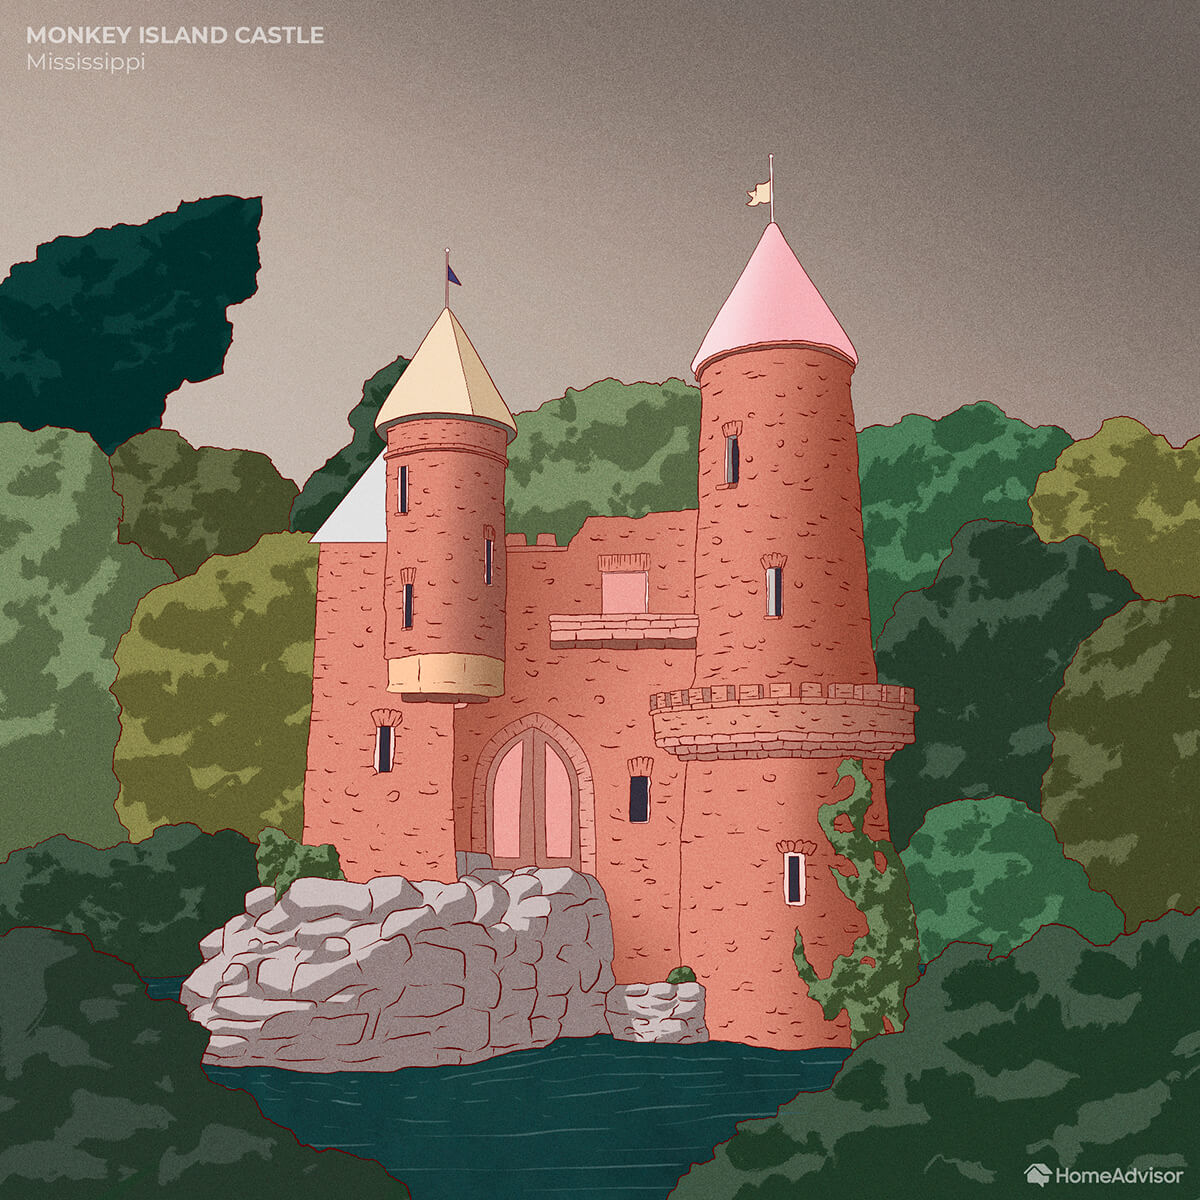 Monkey Island Castle